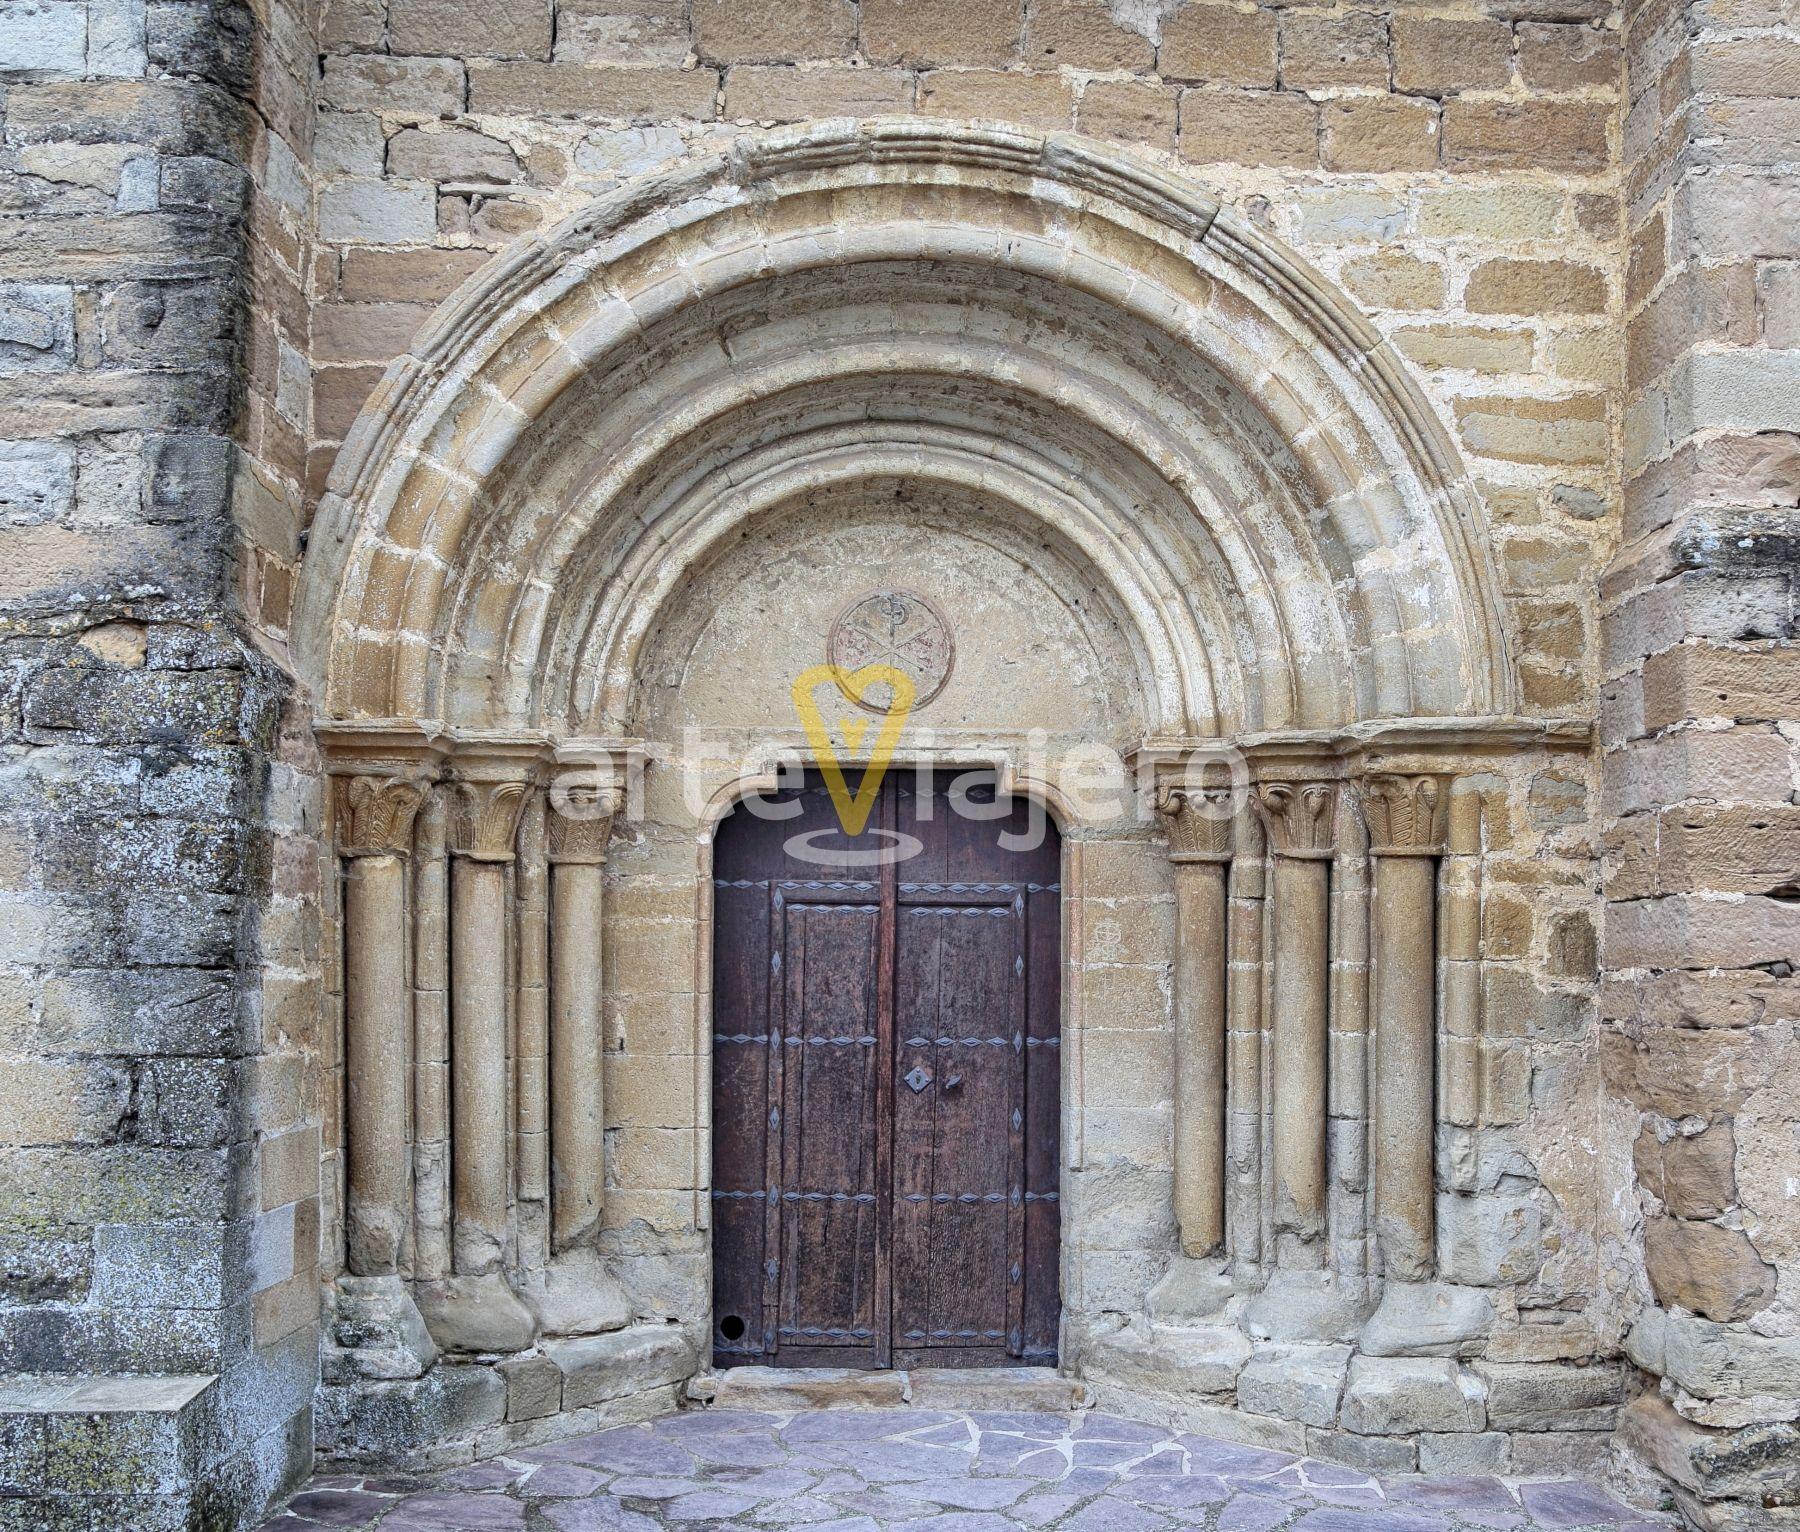 Portada Románica Iglesia De San Andrés Zariquiegui Navarra Zariquiegui Romanico Navarra Caminodesantiago Arte Art R Arquitectura Iglesia Monumentos